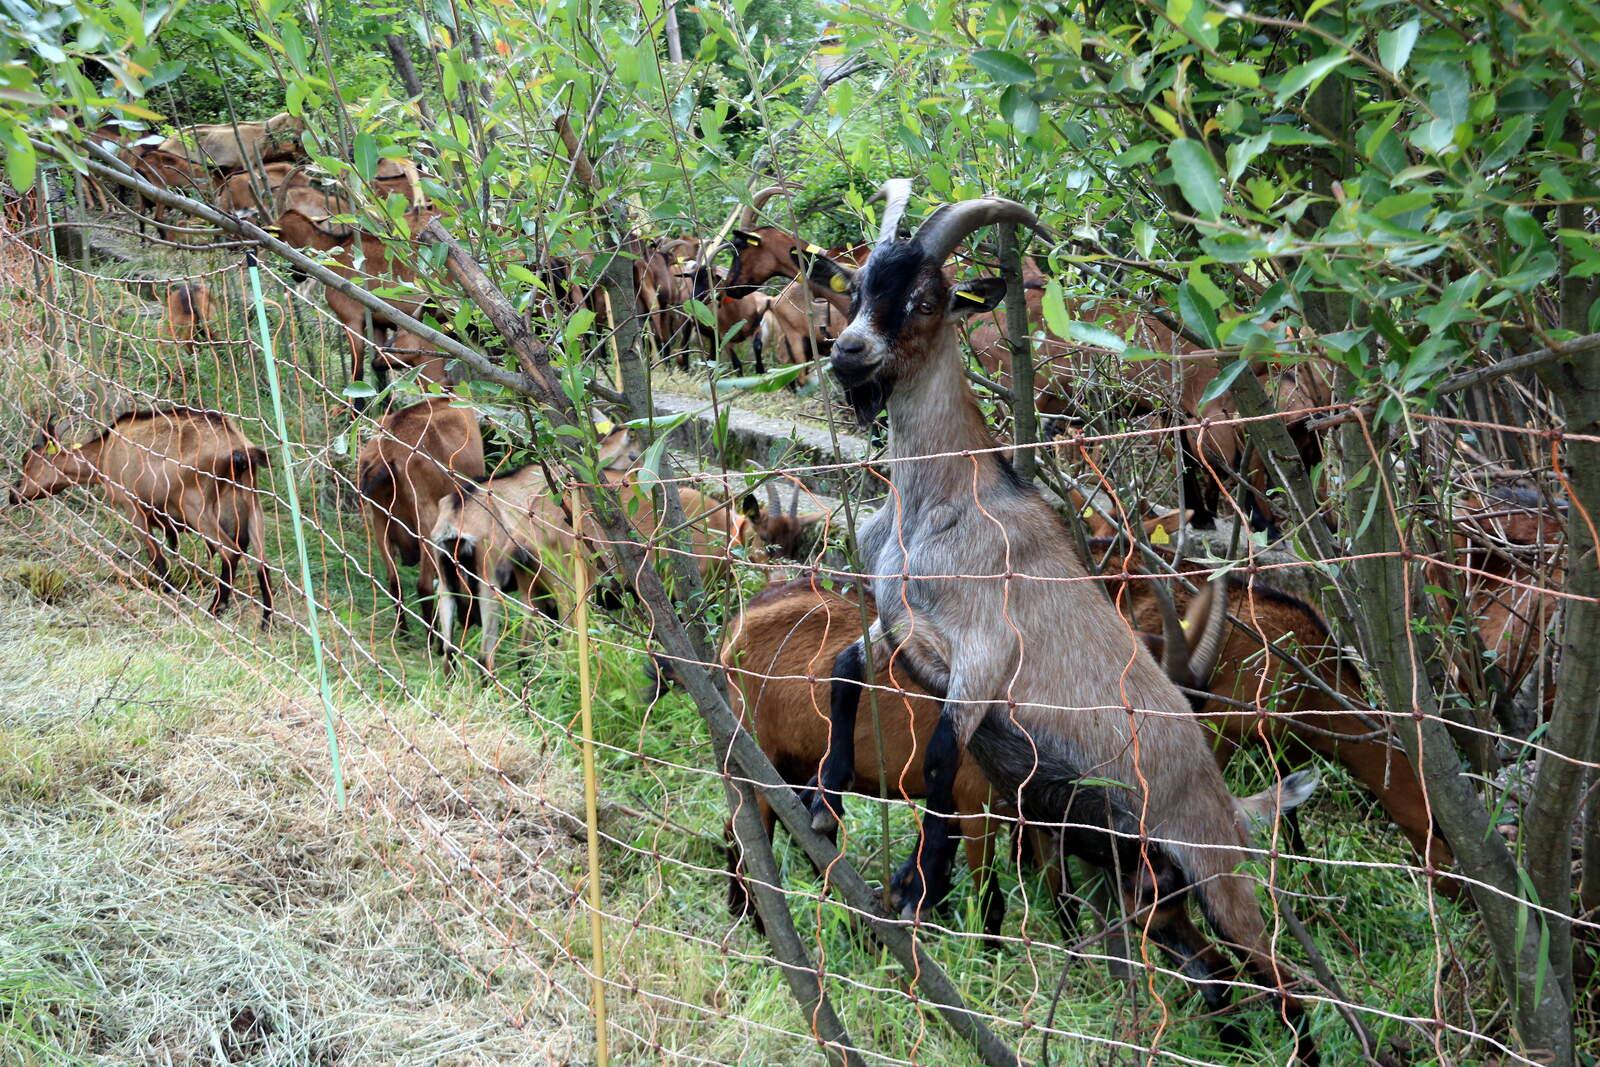 Ramat de cabres menjant d'un hort erm a Vilamur